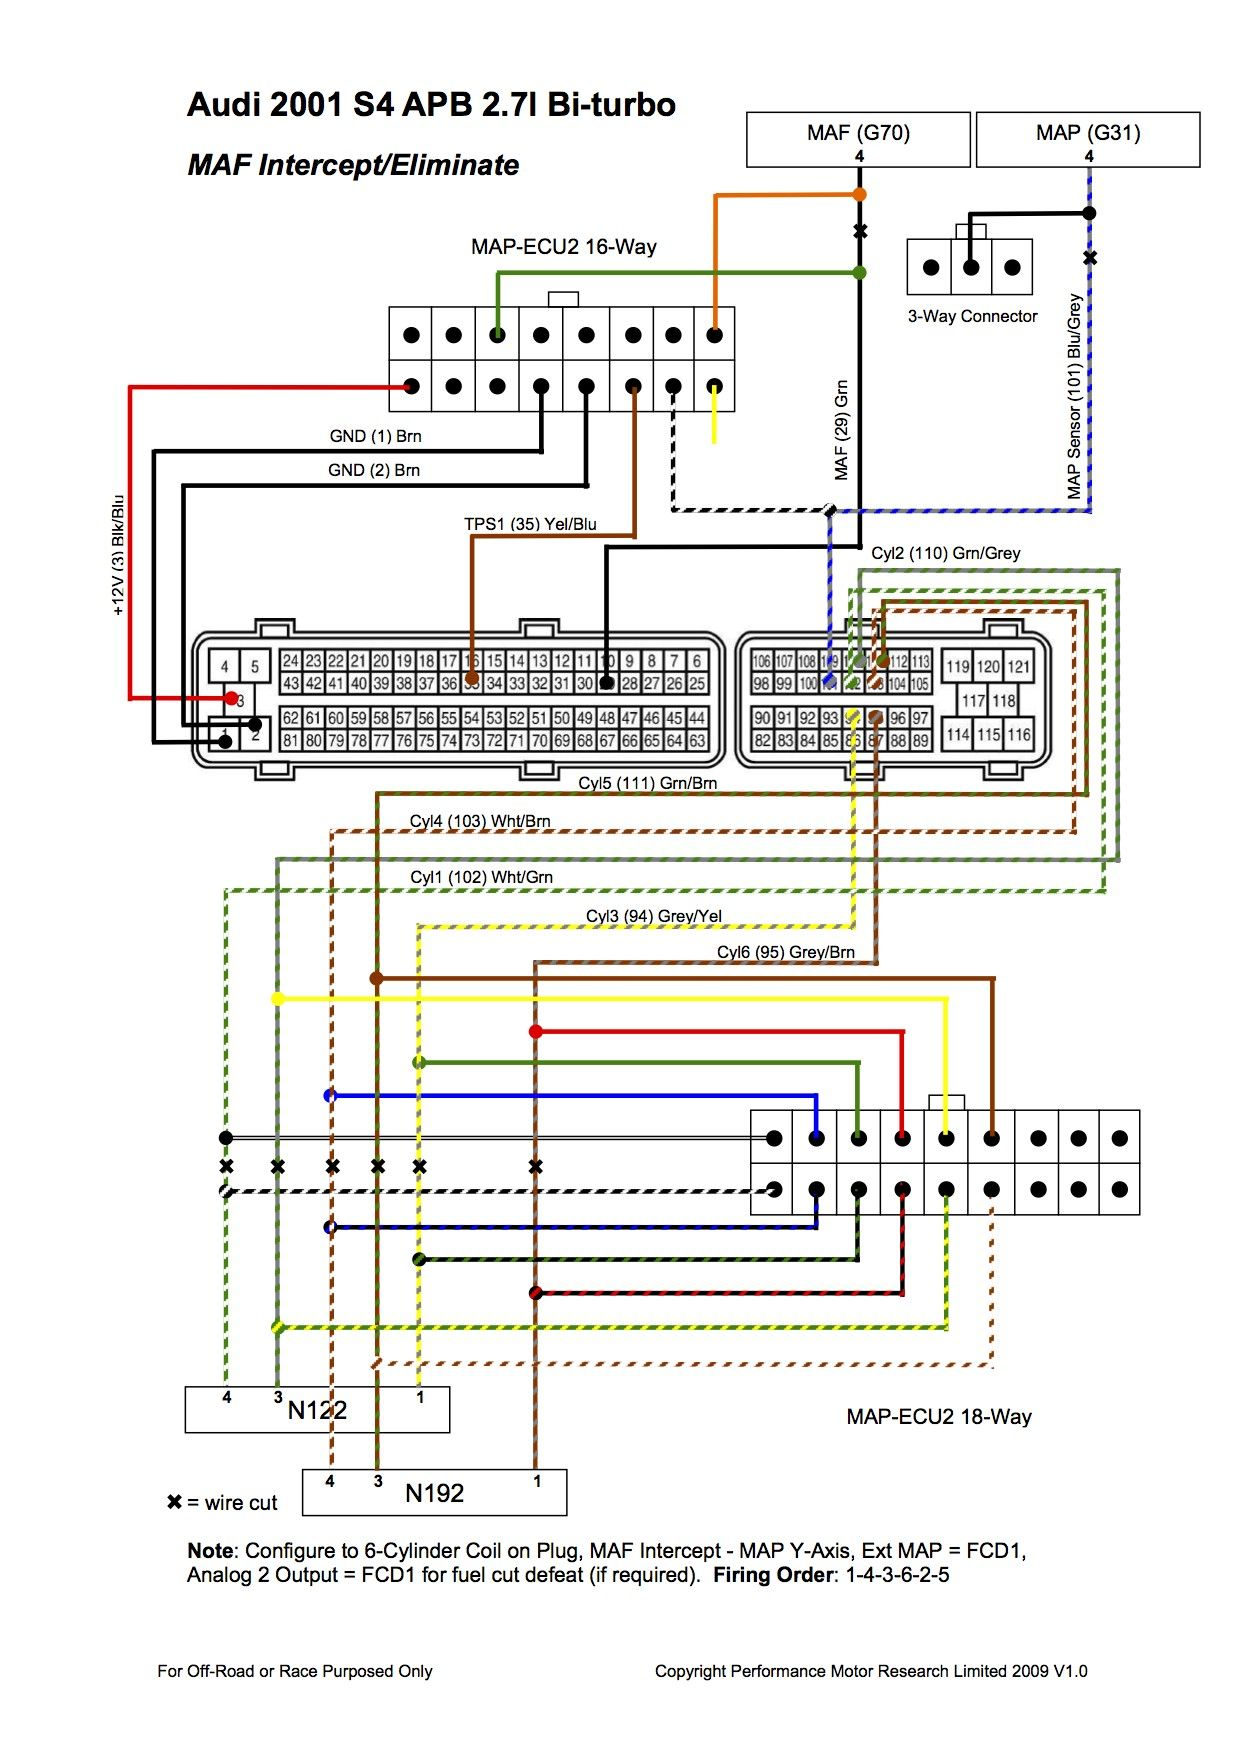 Audi A4 Wiring Diagram Pdf Diagram Diagramtemplate Diagramsample Dodge Durango Electricite Auto Dodge